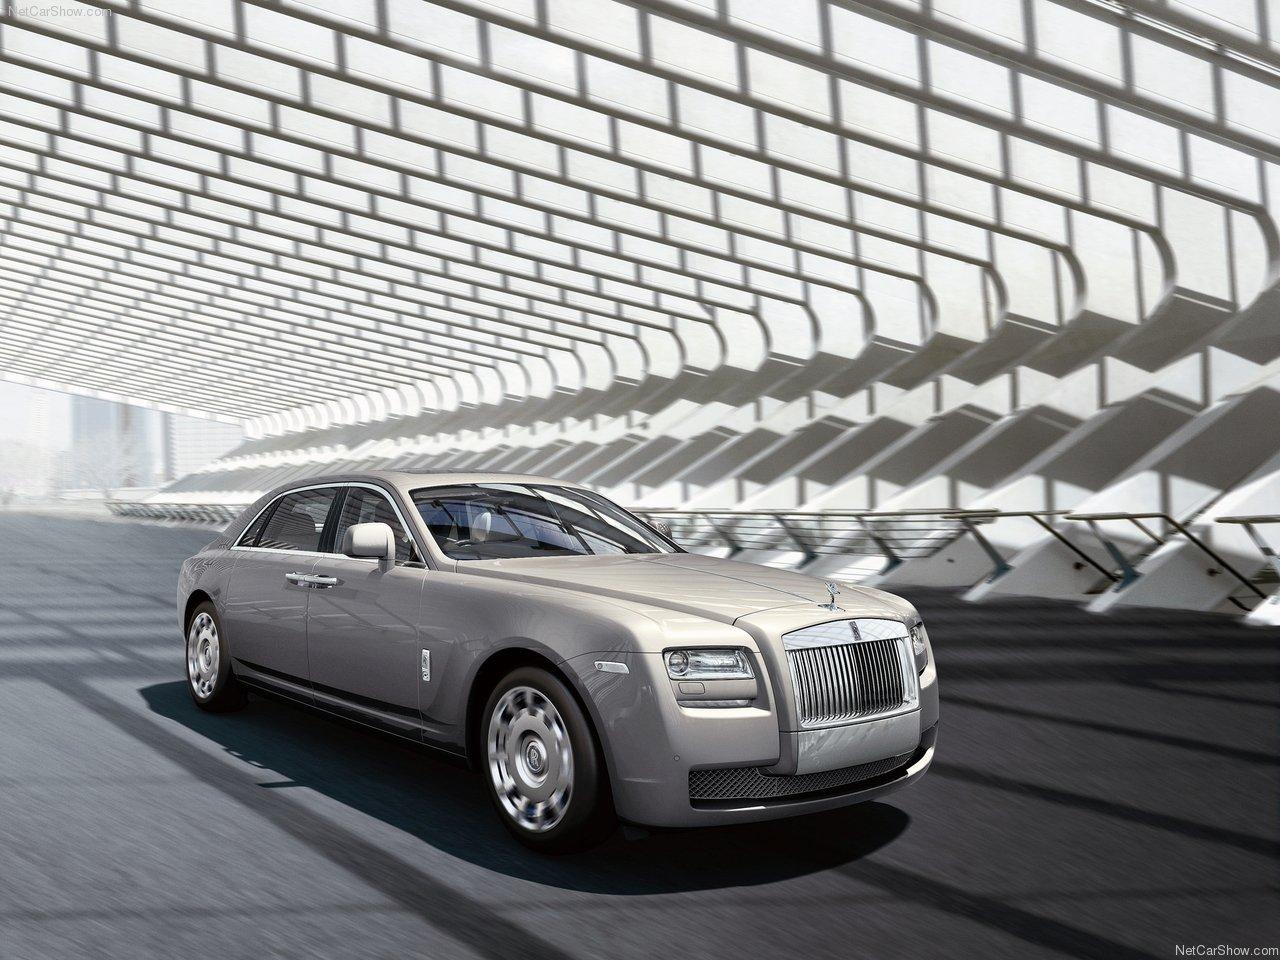 http://4.bp.blogspot.com/-KAUDzDMGMWU/Tlkhbz9ZBYI/AAAAAAAADaQ/f_RR-U1VJSE/s1600/Rolls-Royce-Ghost_Extended_Wheelbase_2012_1280x960_wallpaper_01.jpg